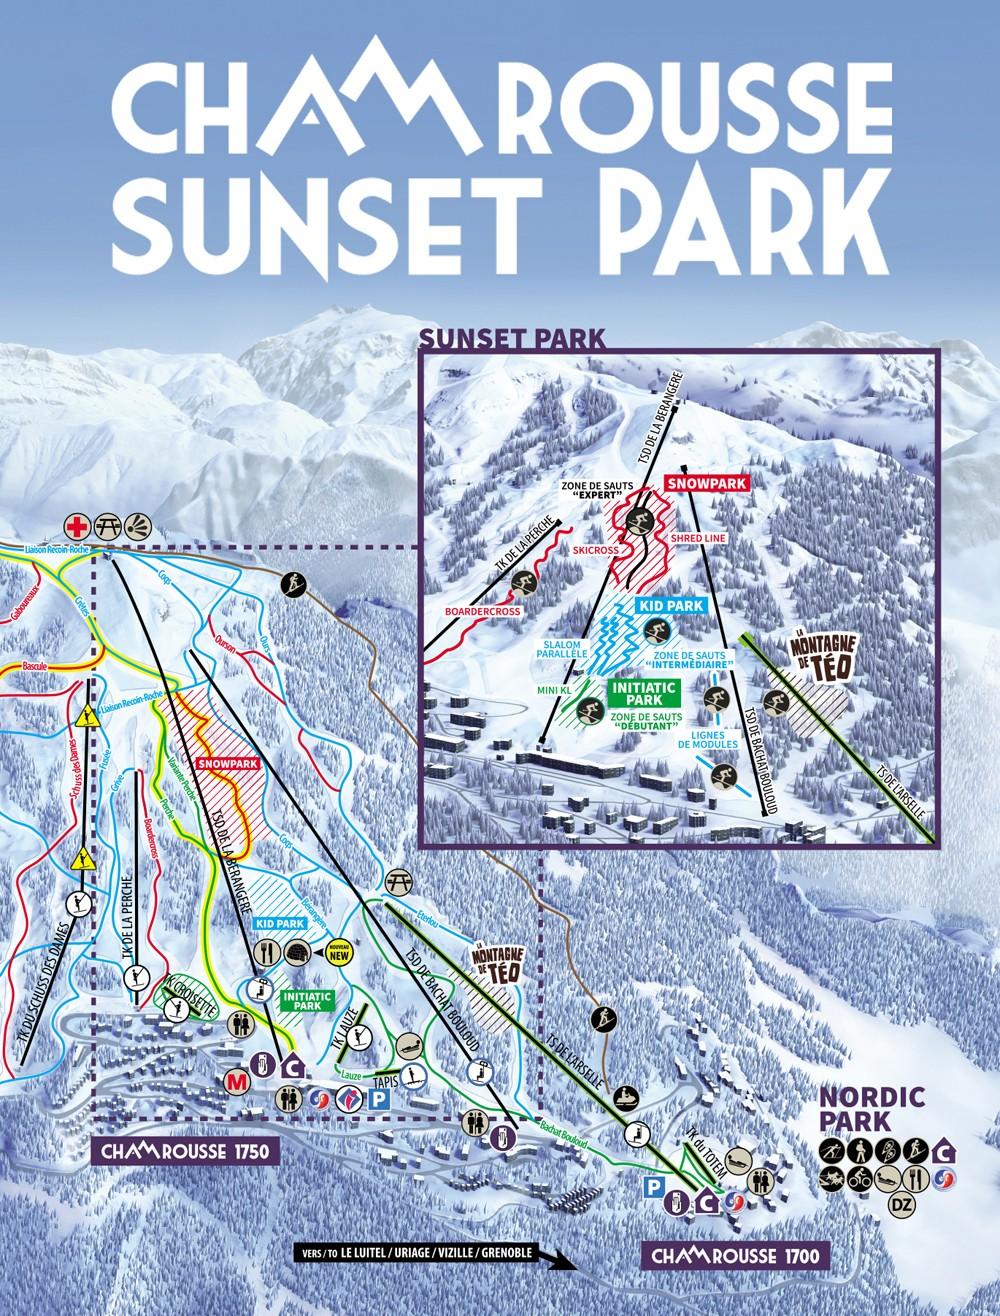 chamrousse-ski-resort-french-alps-sunset-park-map